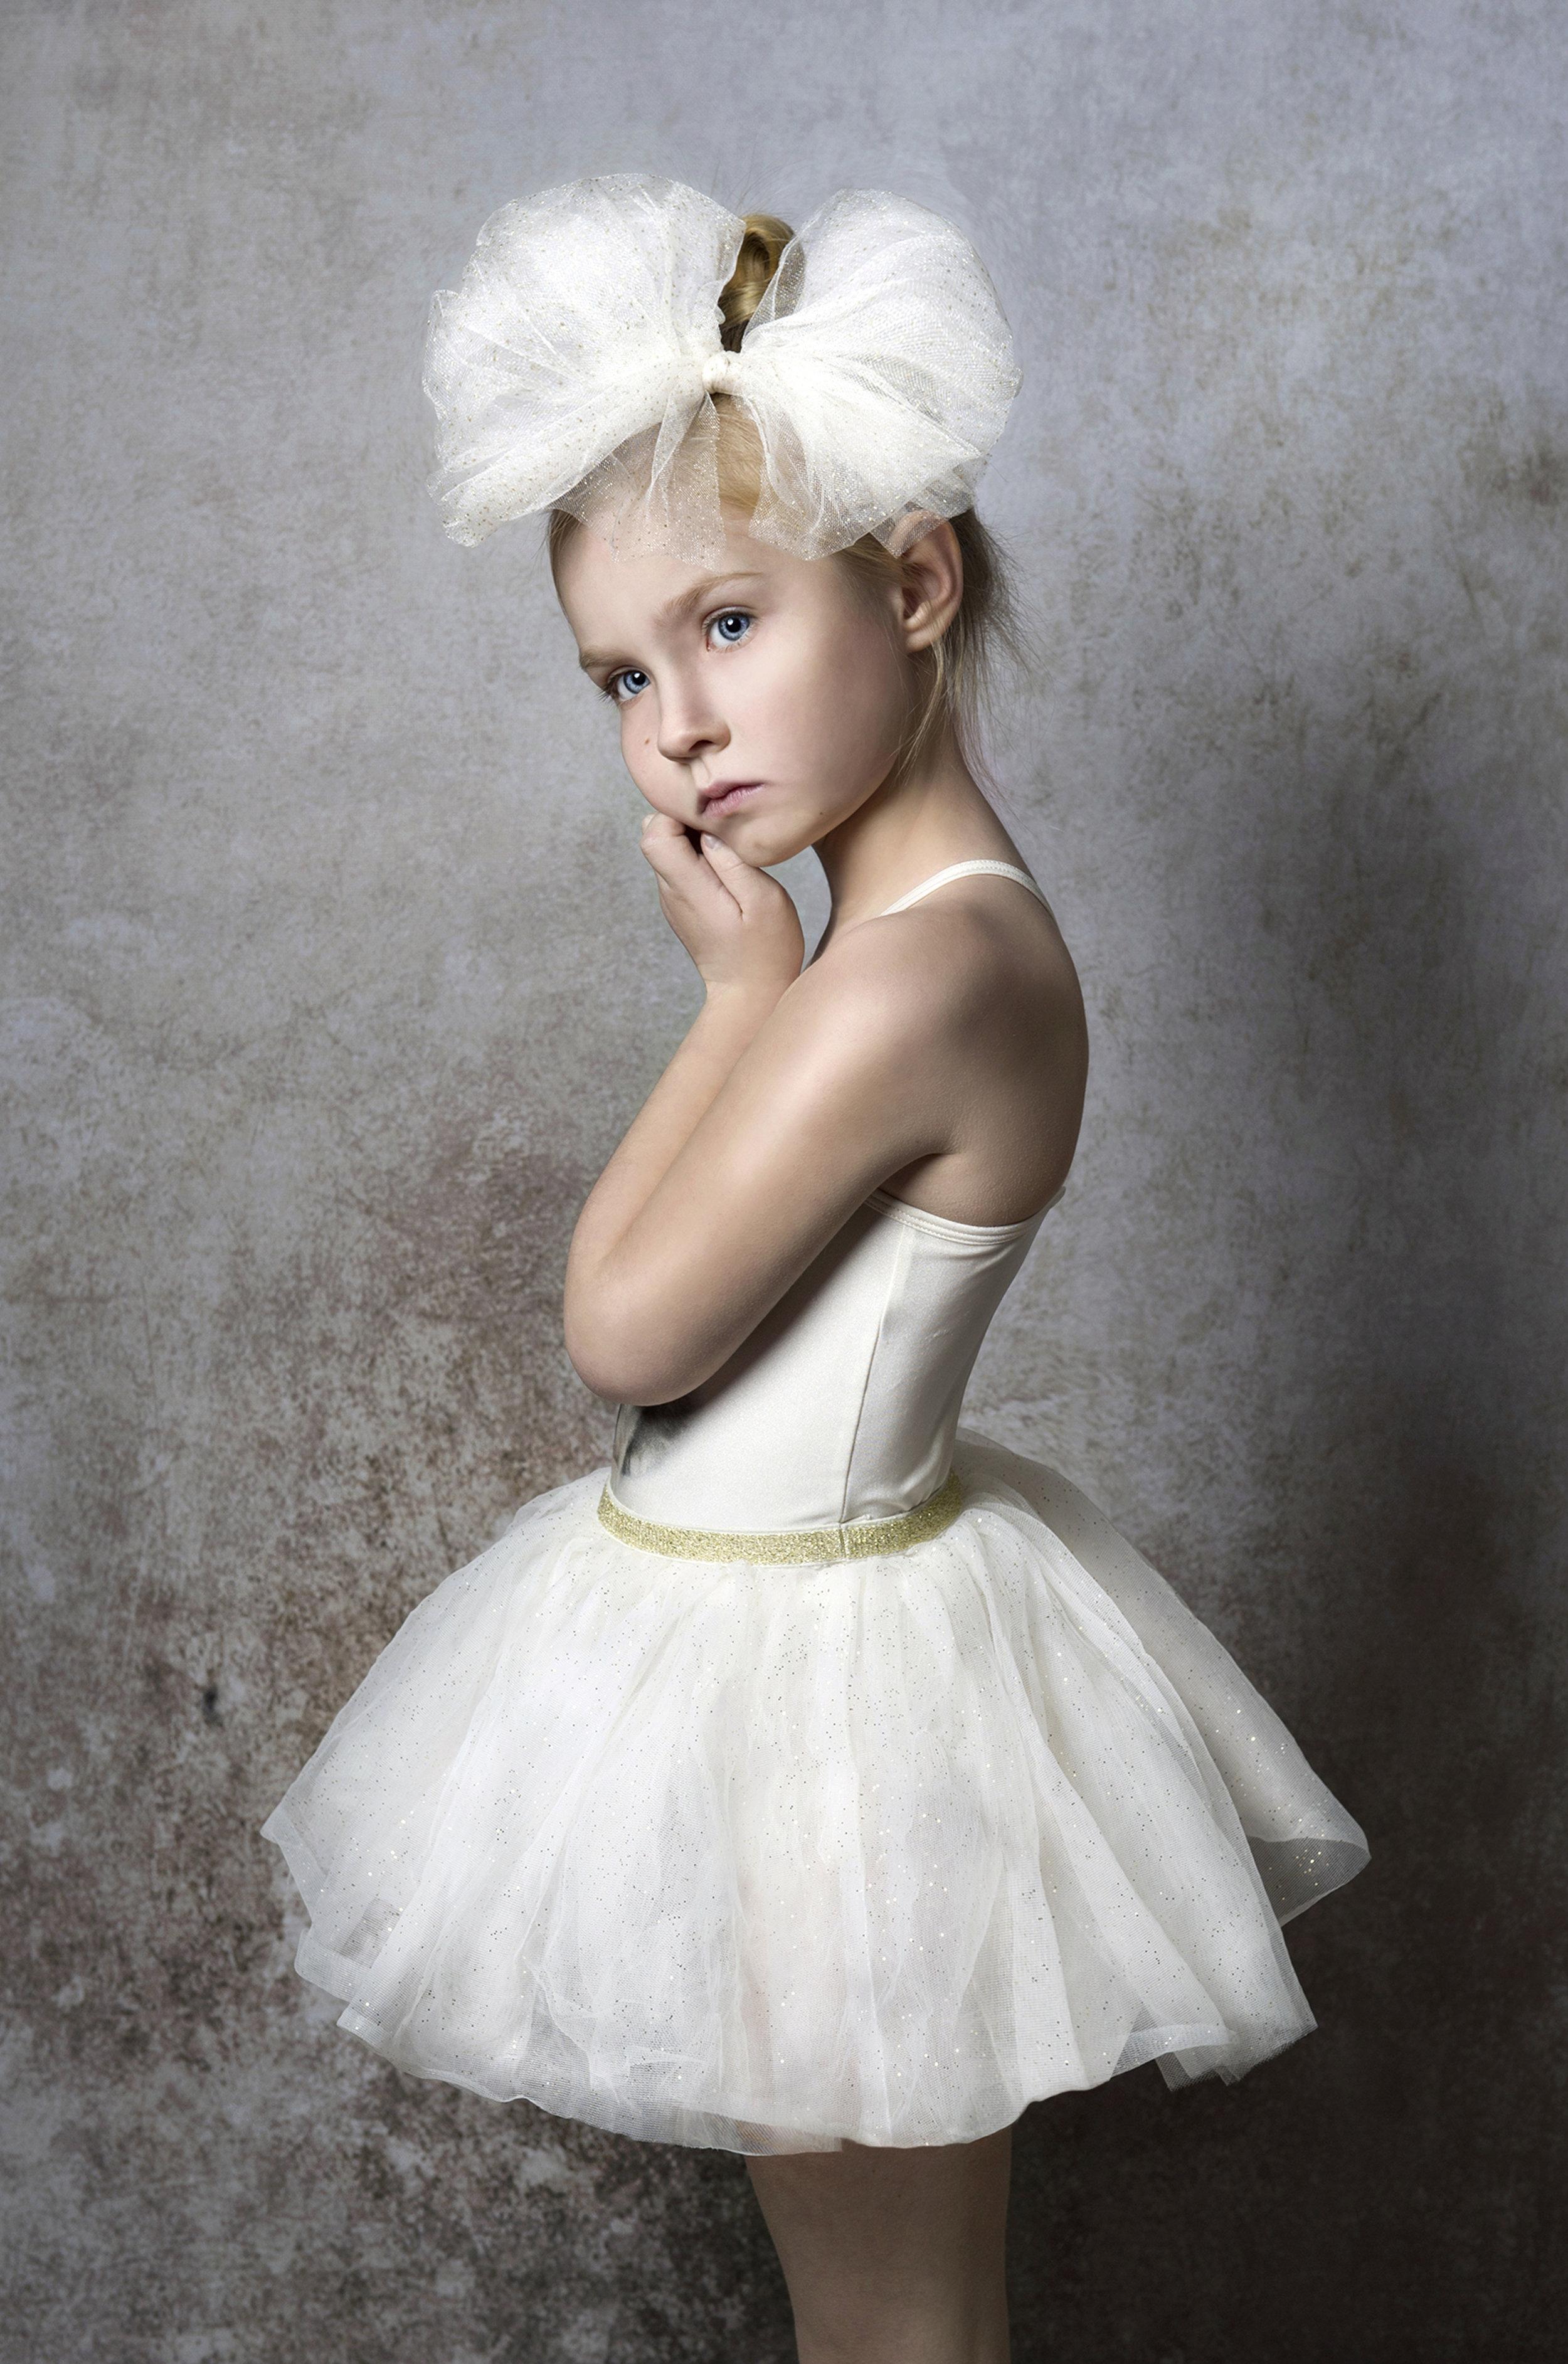 Little ballerina1.jpg